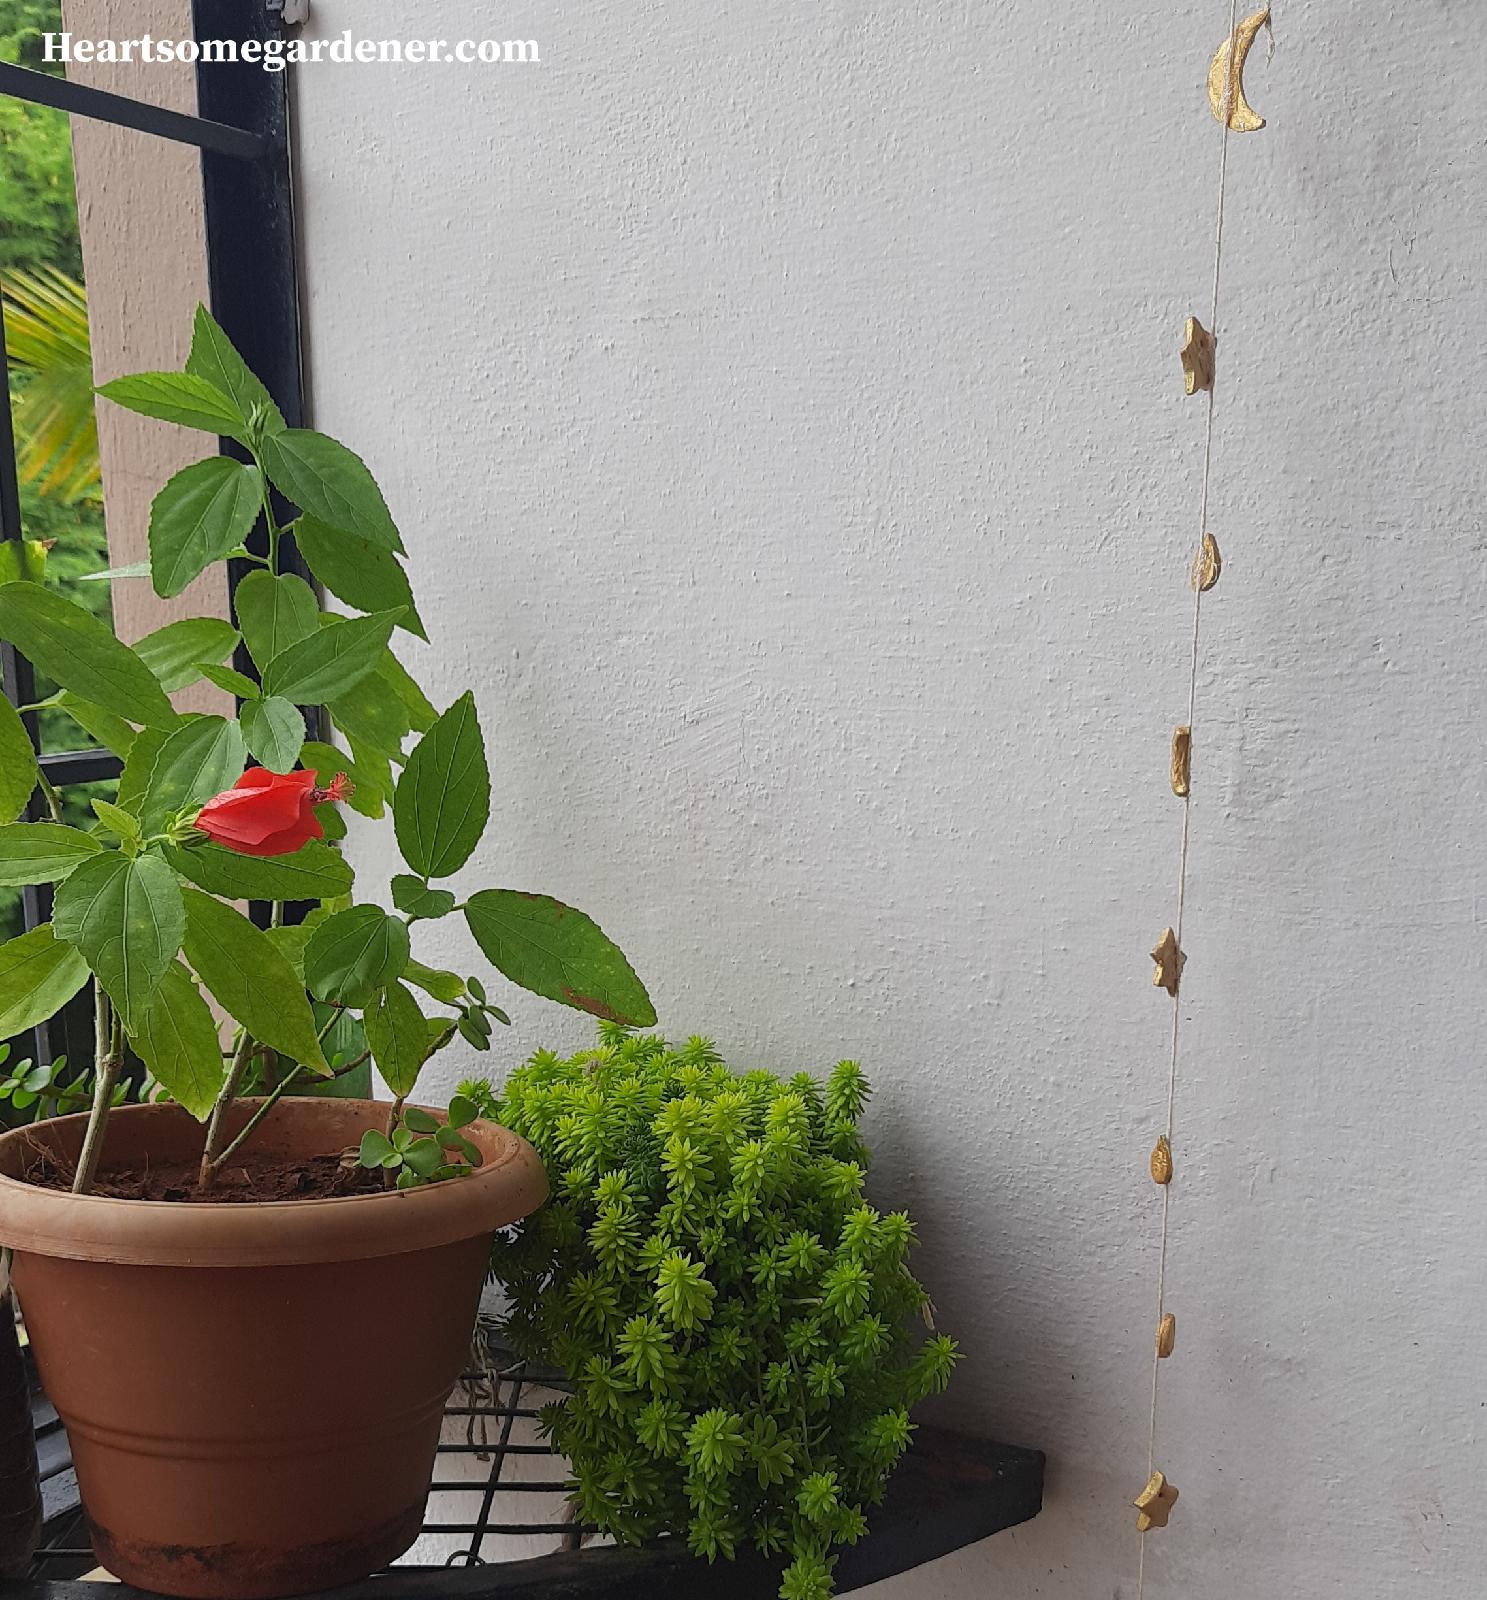 Turks cap plant - grow in Apartments